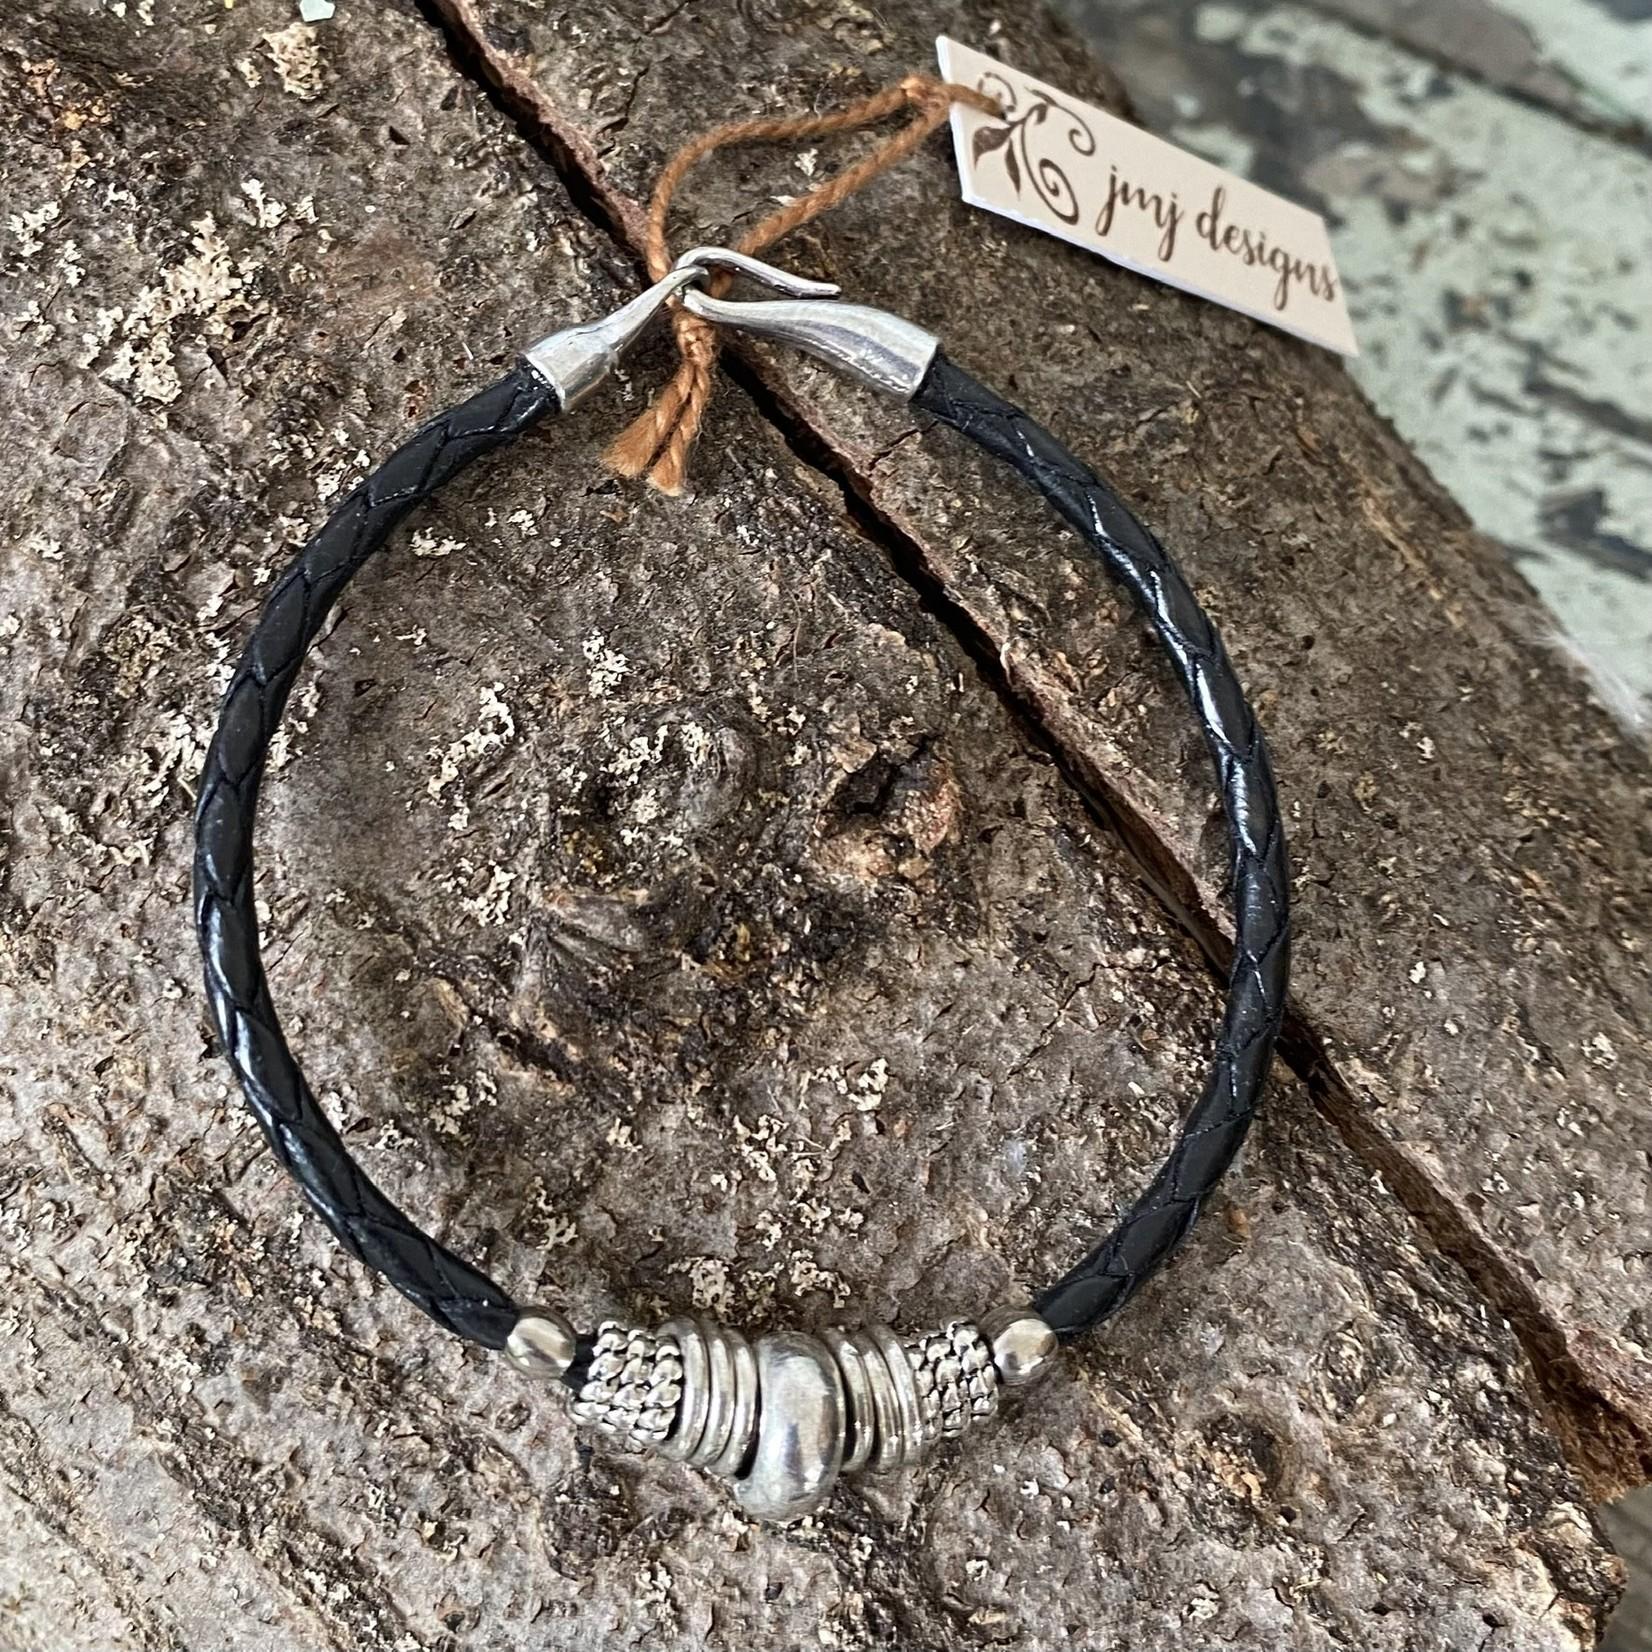 Julia Jones JMJ 921-60 Black Braided Leather Bracelet -Silver Rings